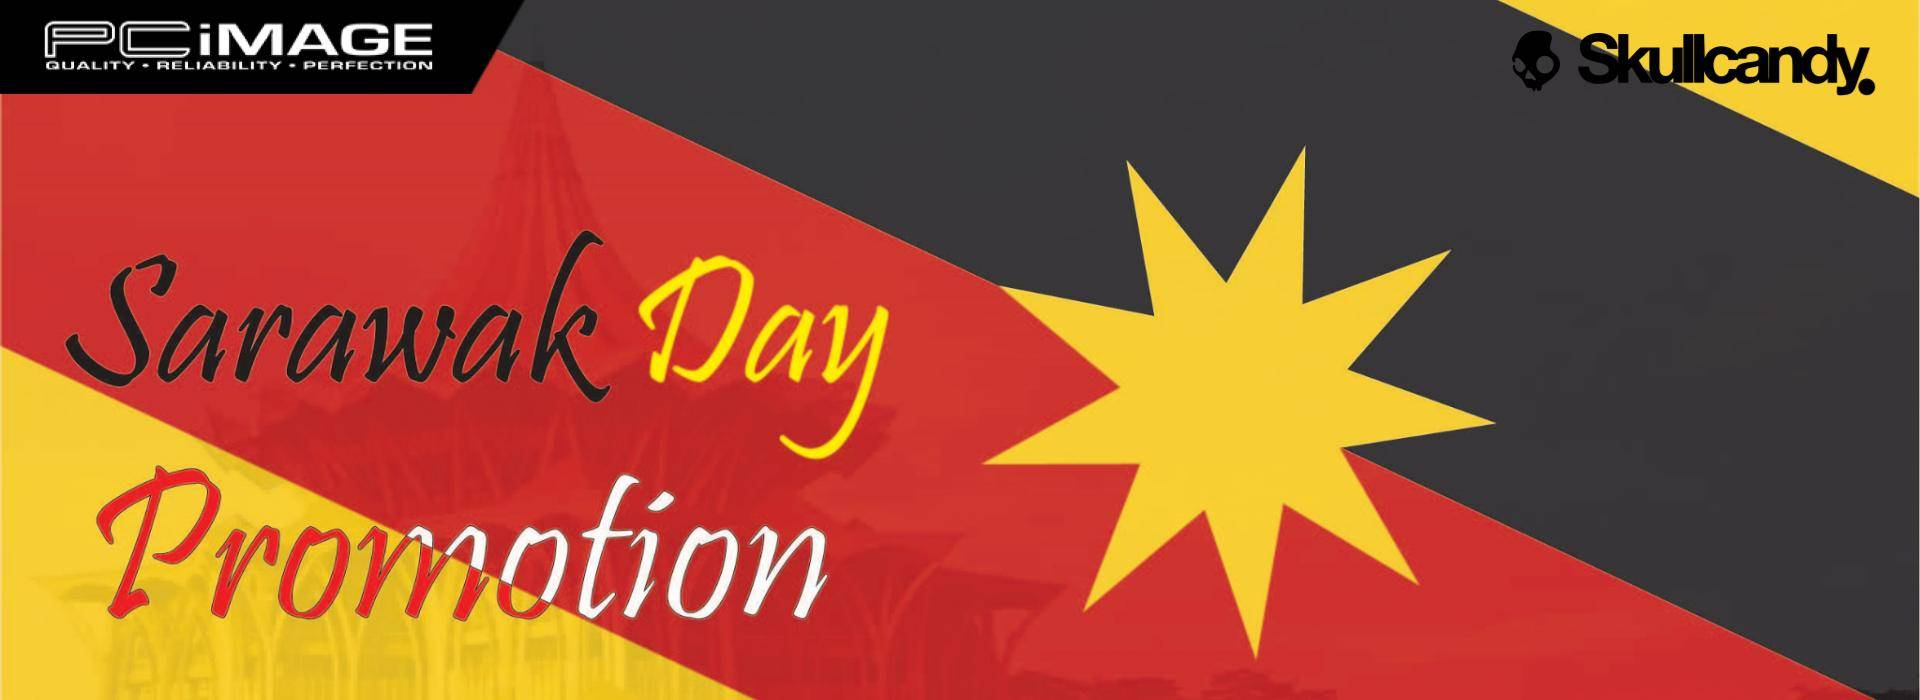 Skullcandy Sarawak Day 31 Jul